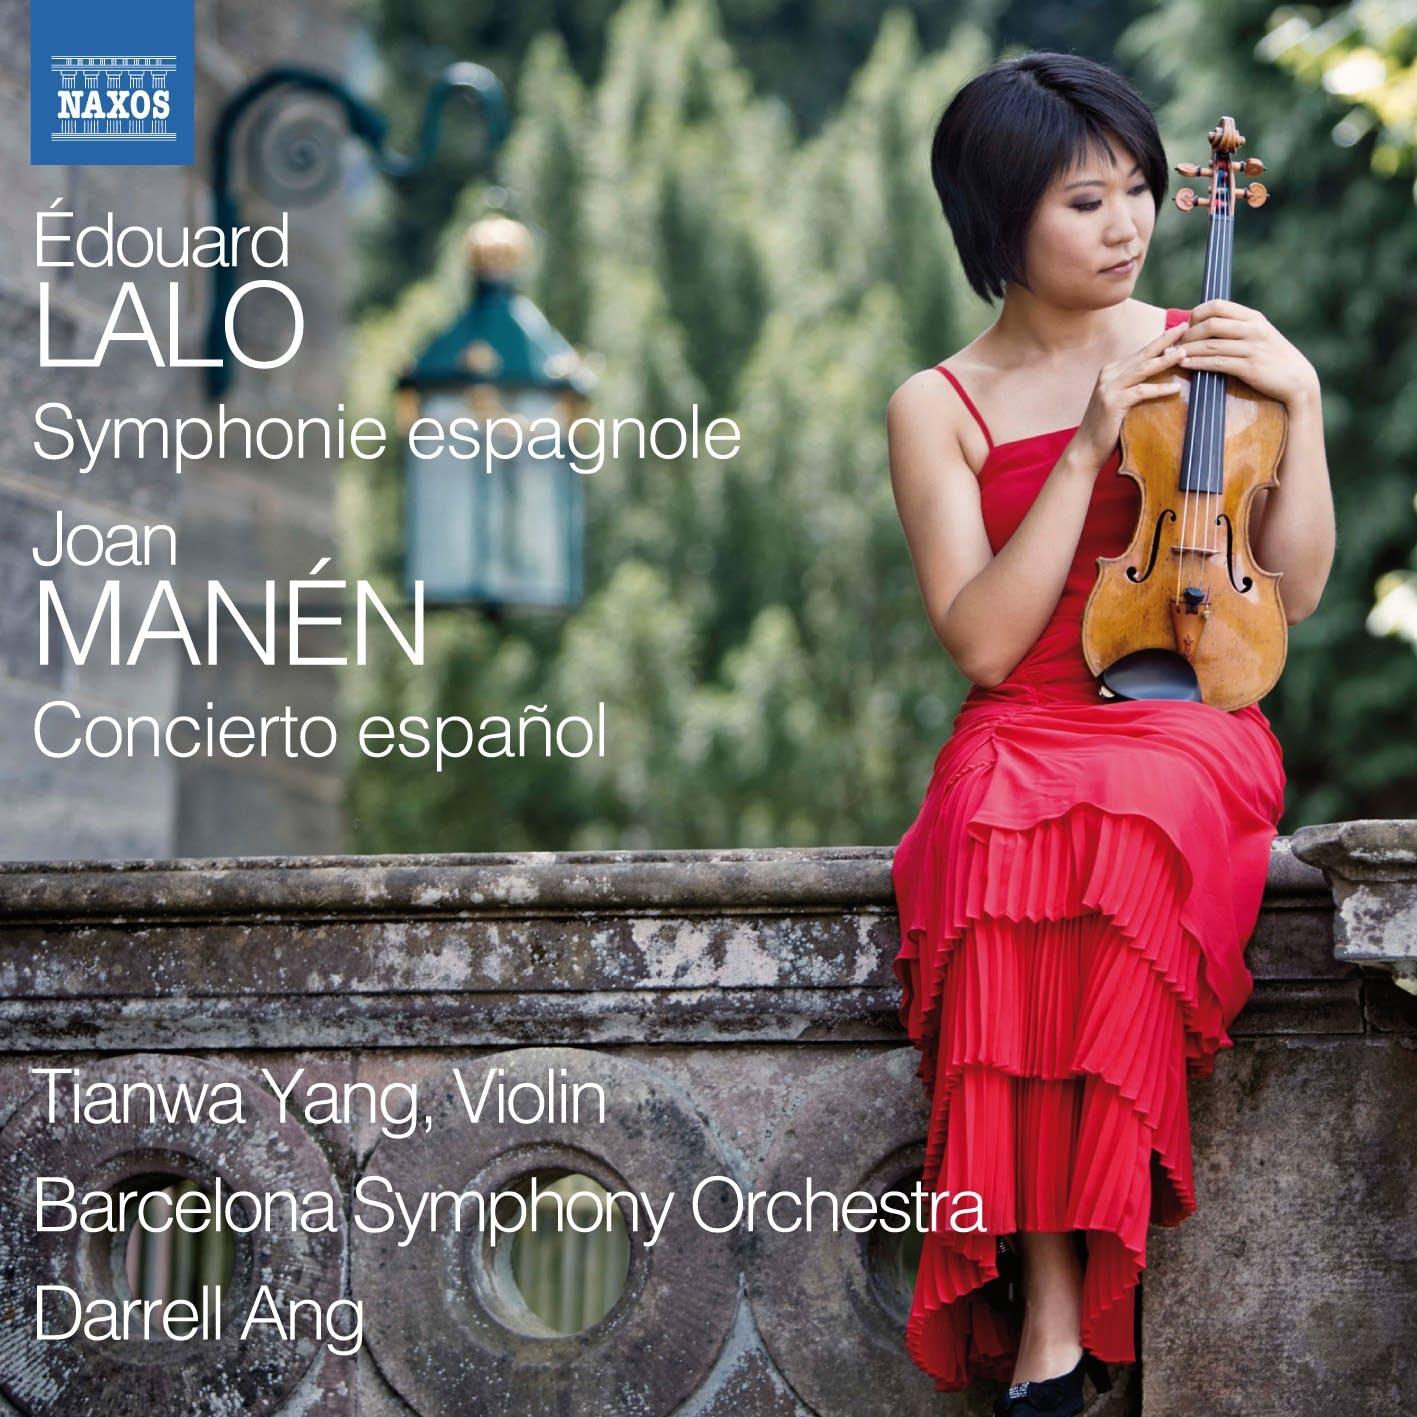 Edouard Lalo - Symphonie espagnole: V. Rondo